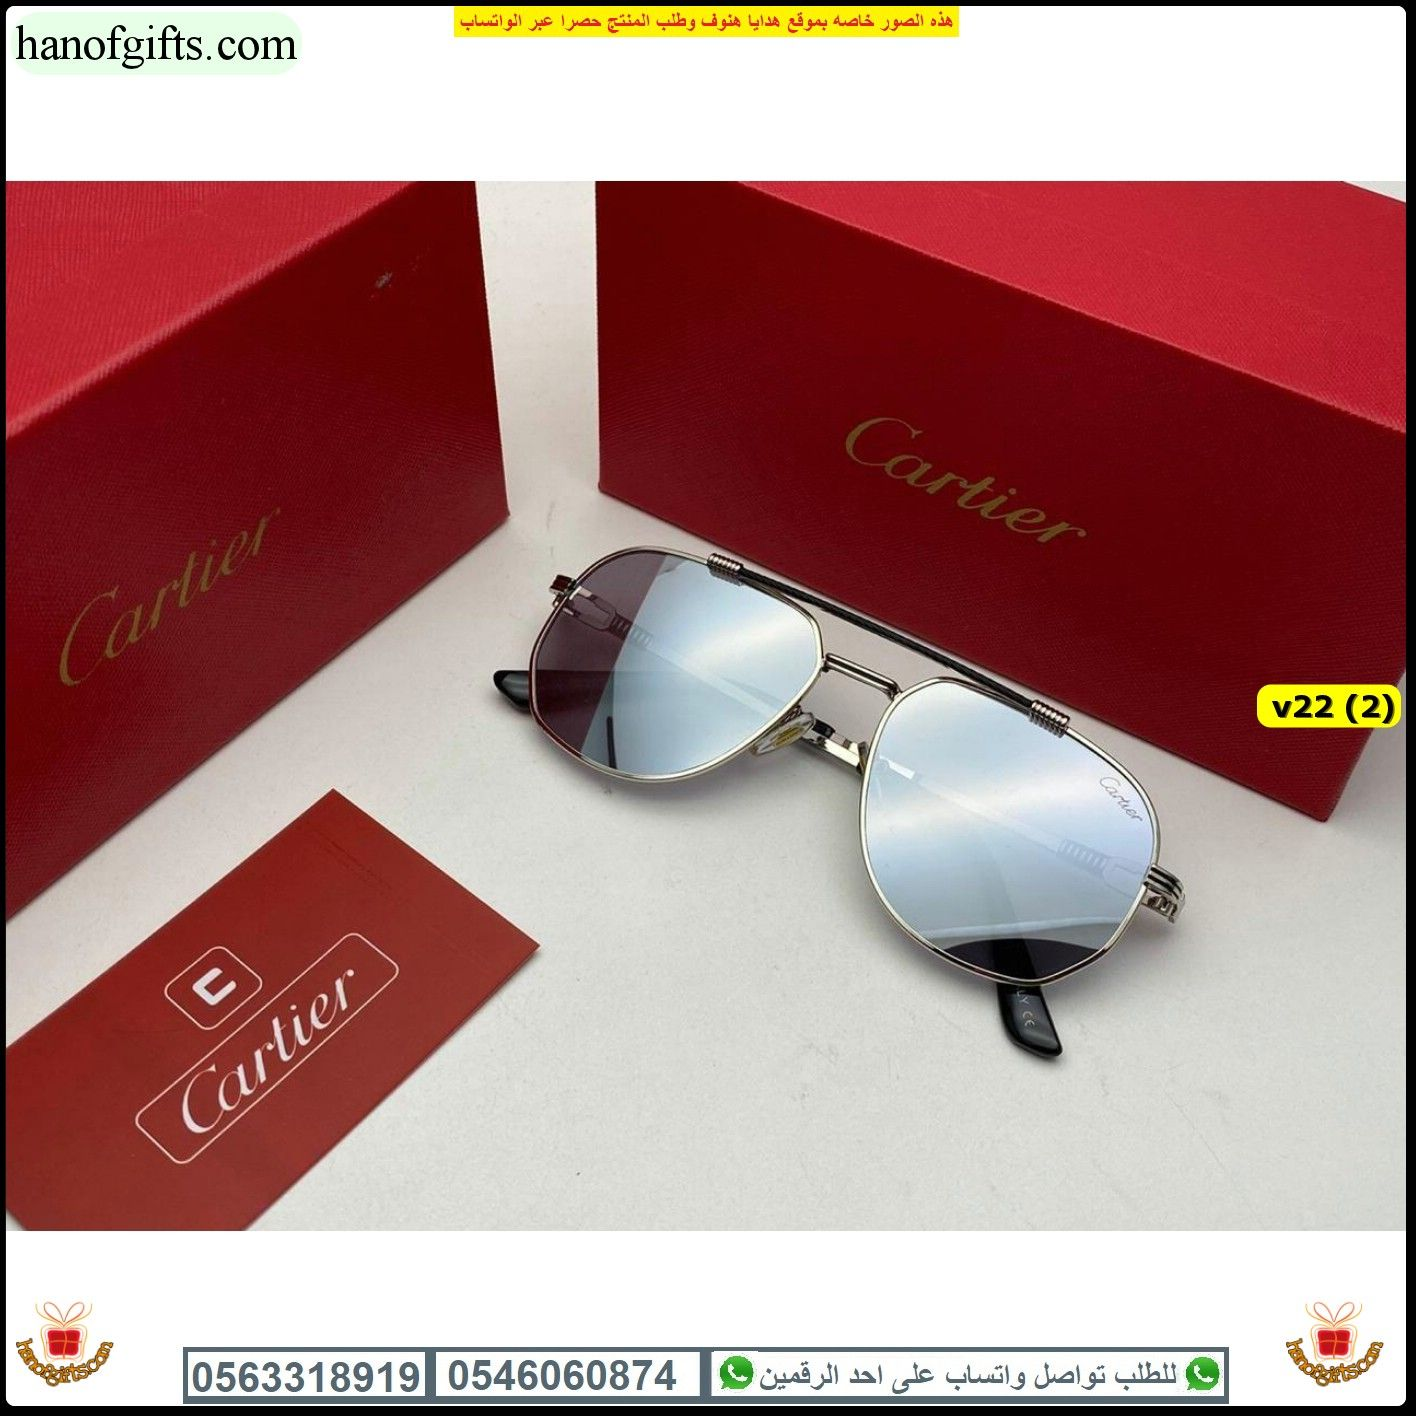 محفظة كارتير رجالي مع نظاره كارتير بجودة ممتازة مع ملحقات الماركه هدايا هنوف In 2021 Sunglasses Case Sunglasses Glasses